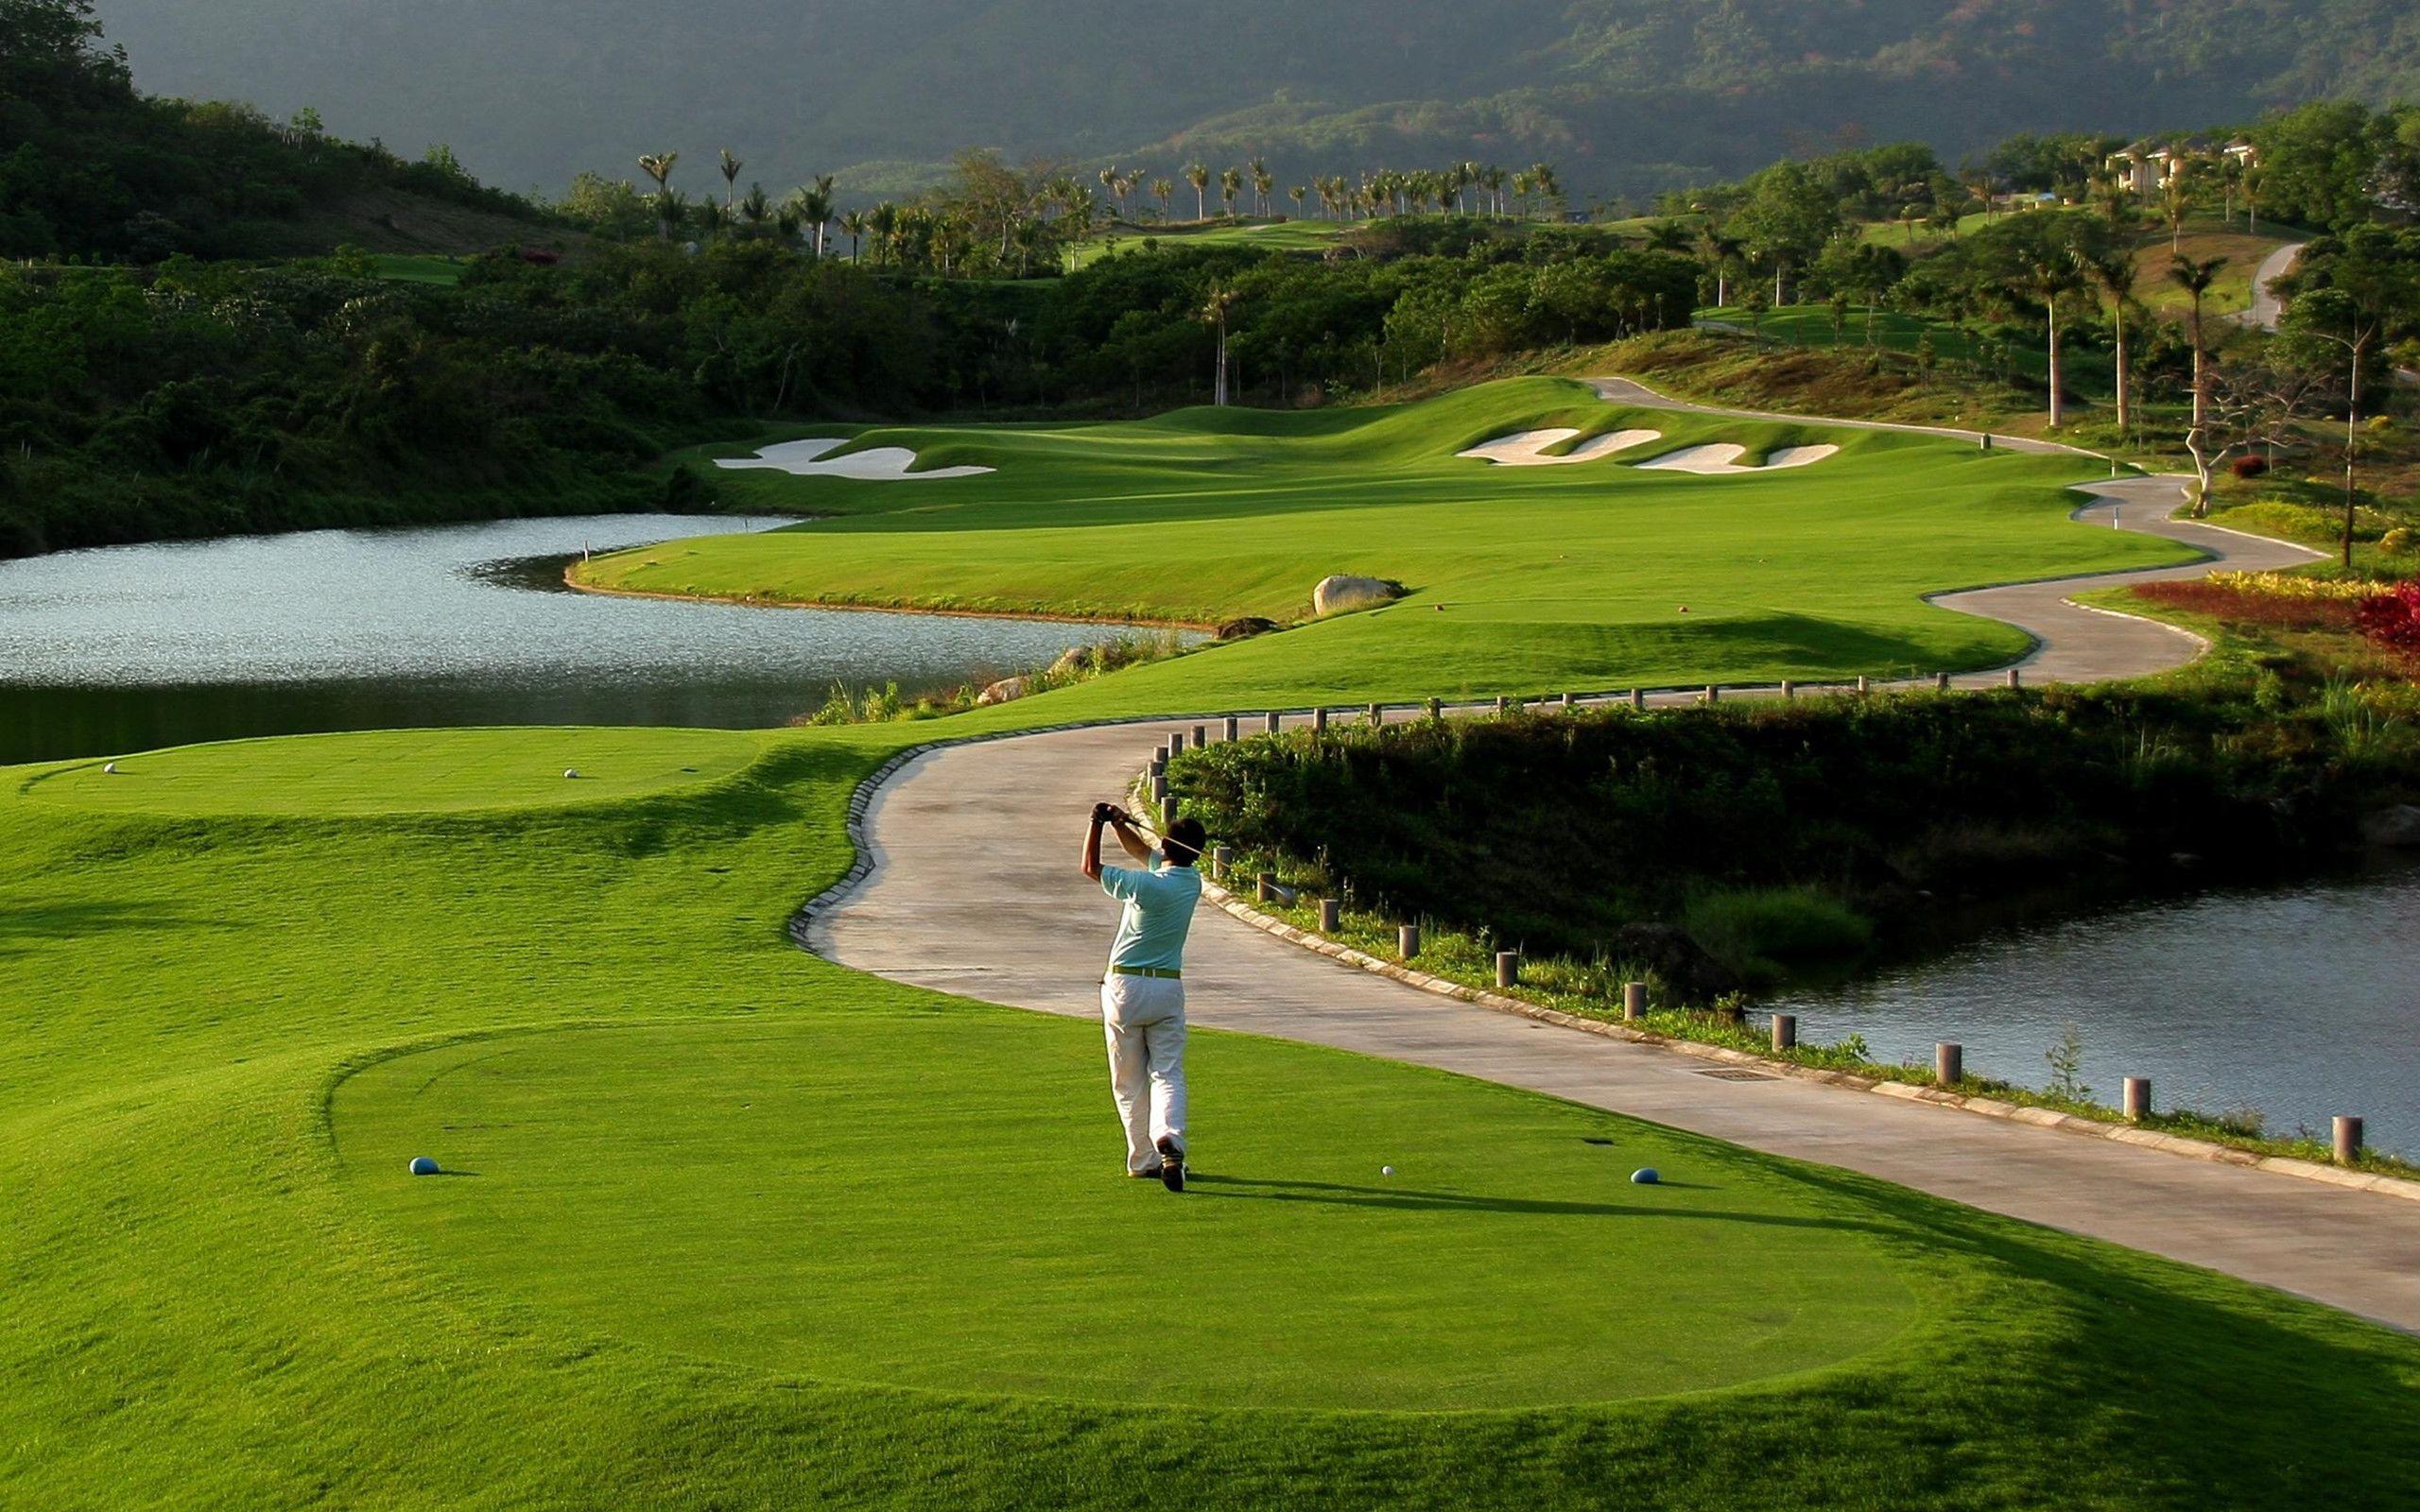 Golfing Desktop Wallpapers Top Free Golfing Desktop Backgrounds Wallpaperaccess